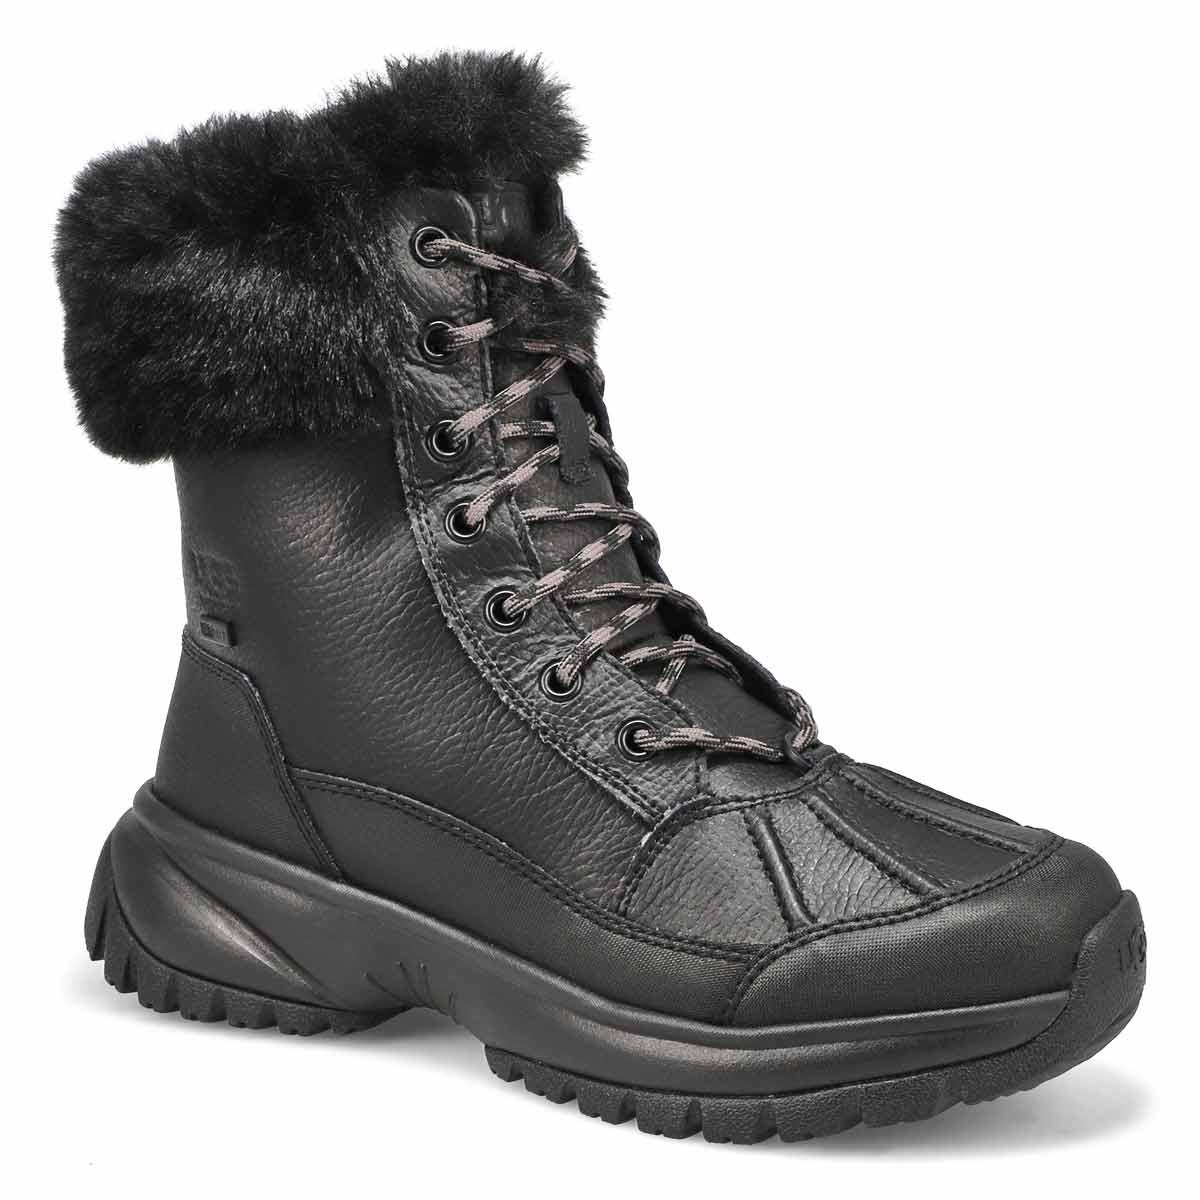 Bottes d'hiver YOSE FLUFF, noir, femmes